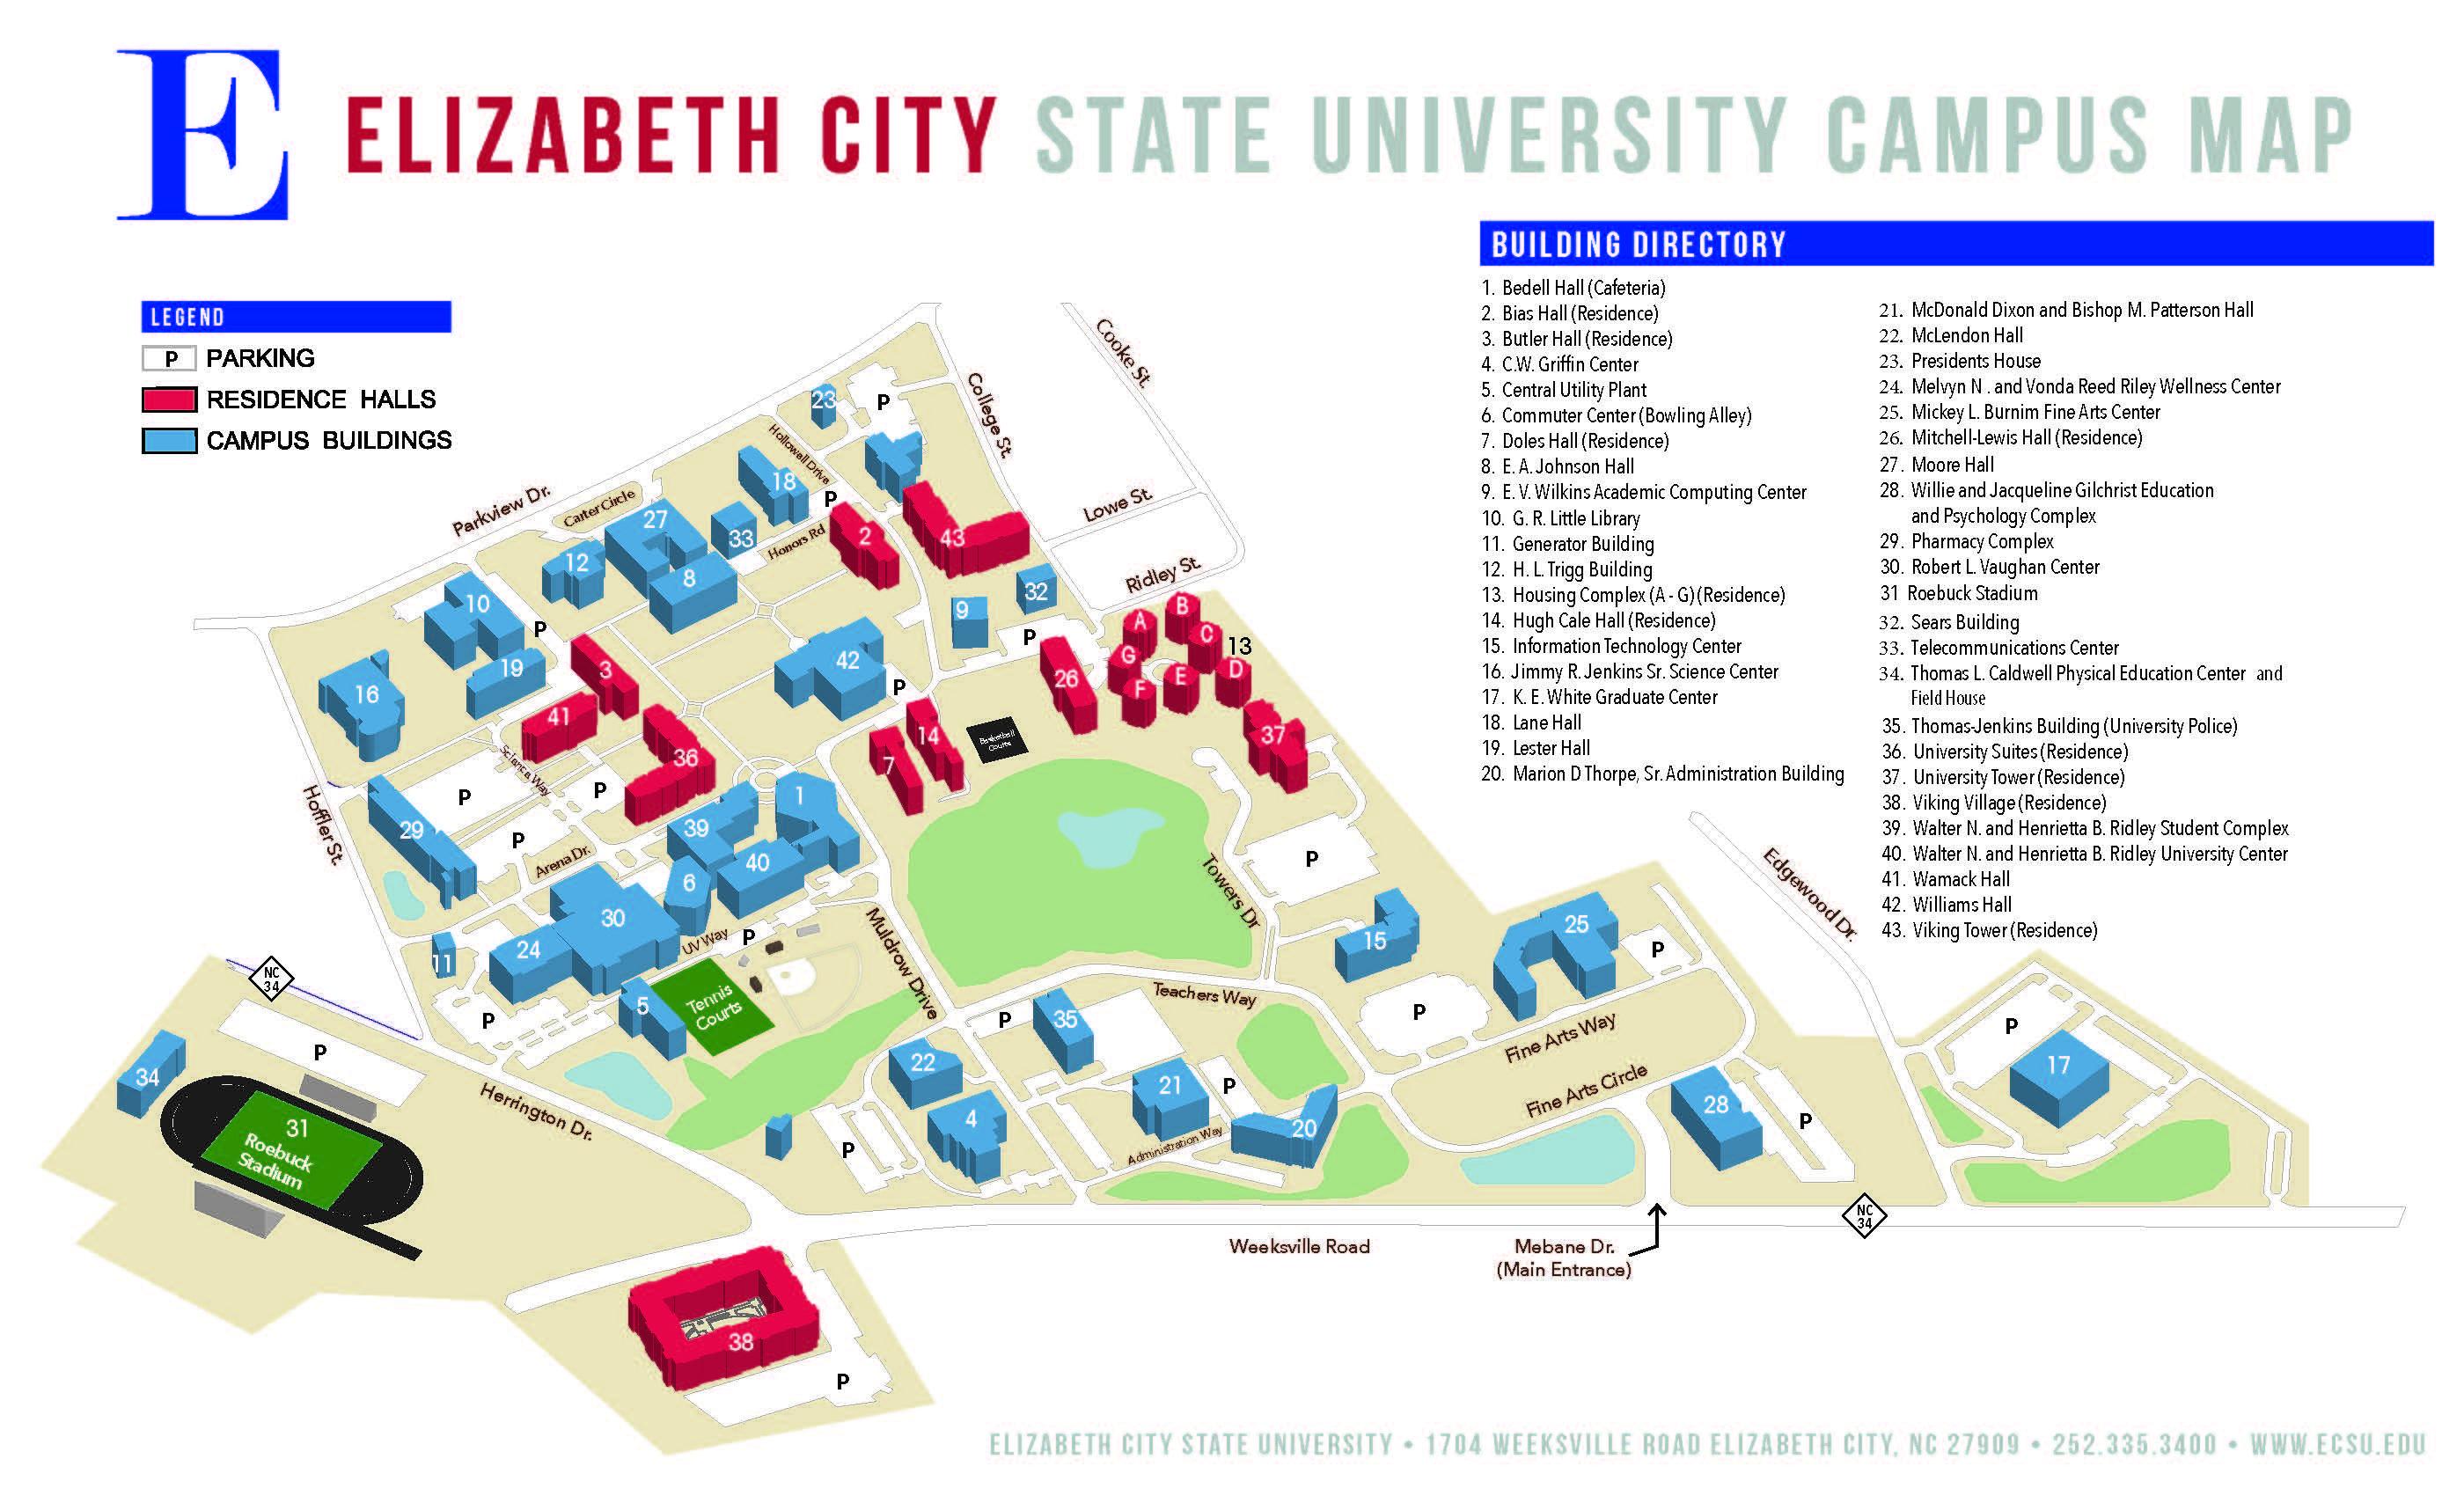 eastern connecticut state university map Ecsu Campus Map eastern connecticut state university map